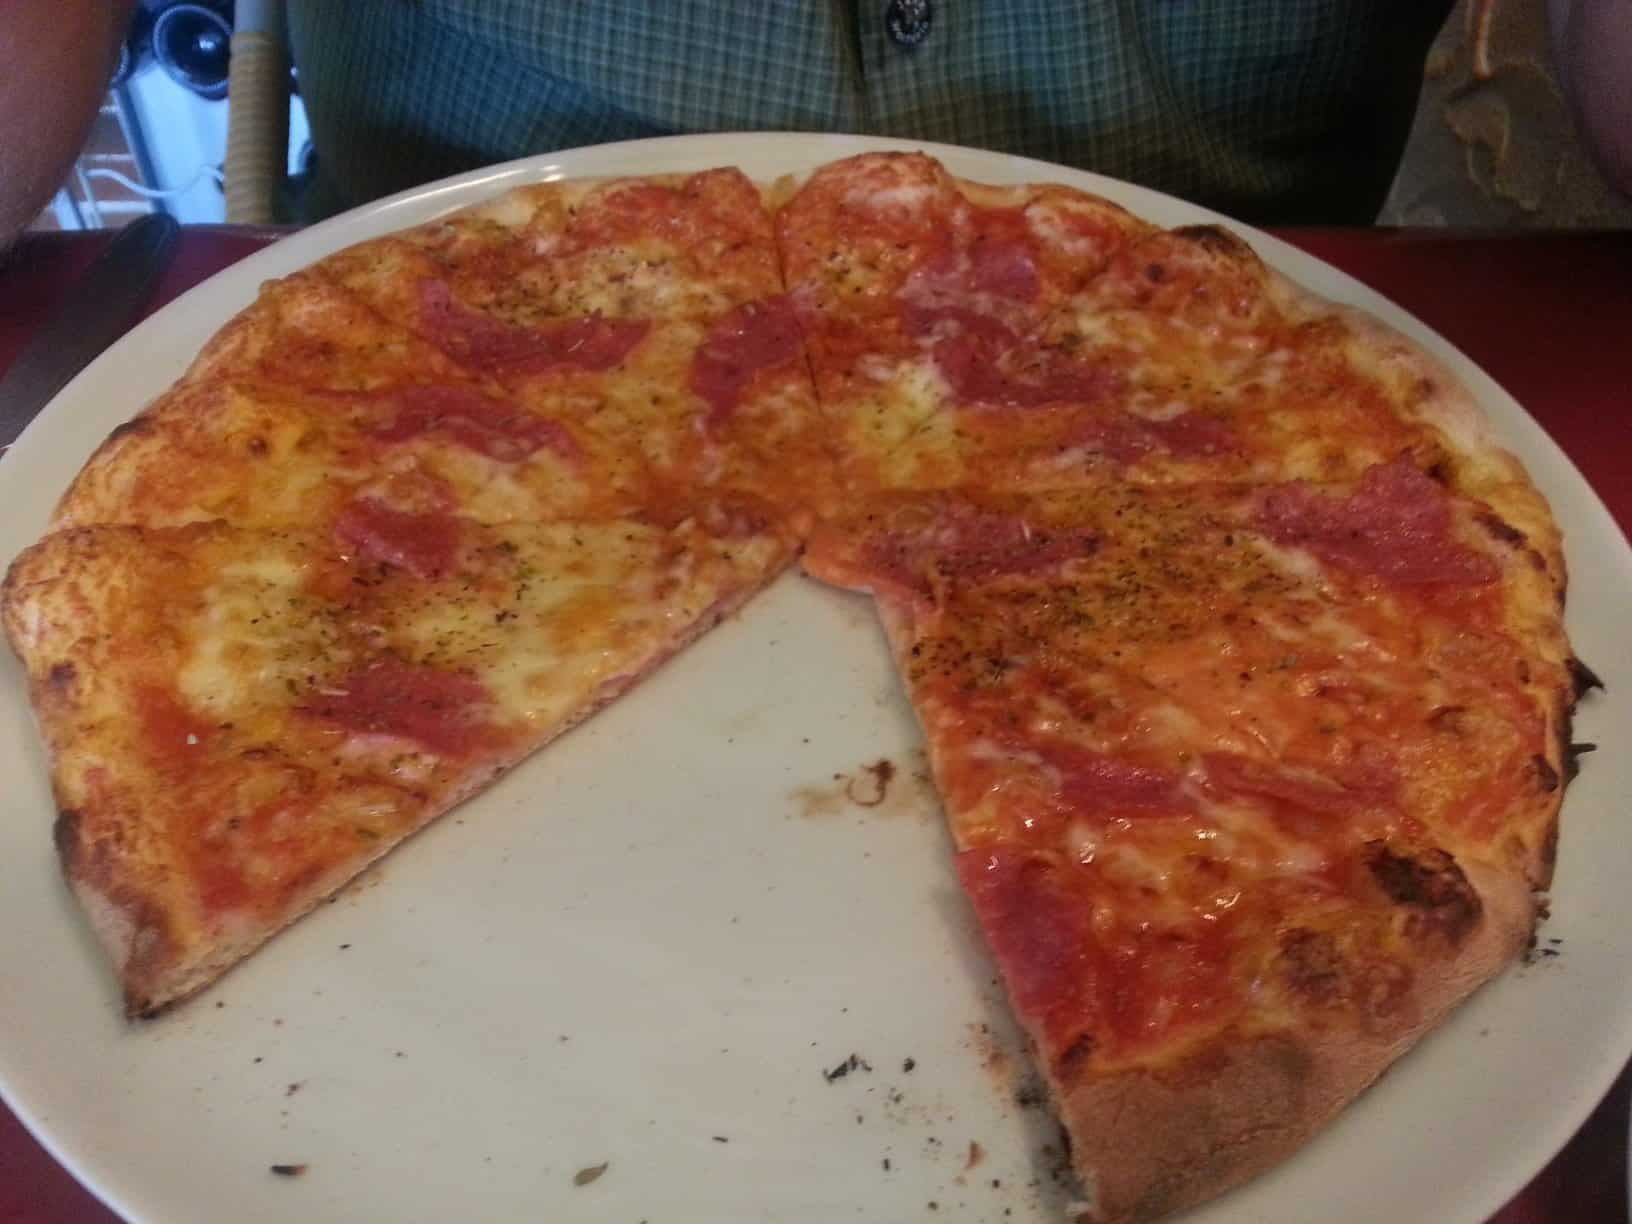 Mittagessen in Fellbach: Enzo\'s Pizza Rusticale | Hubert-testet